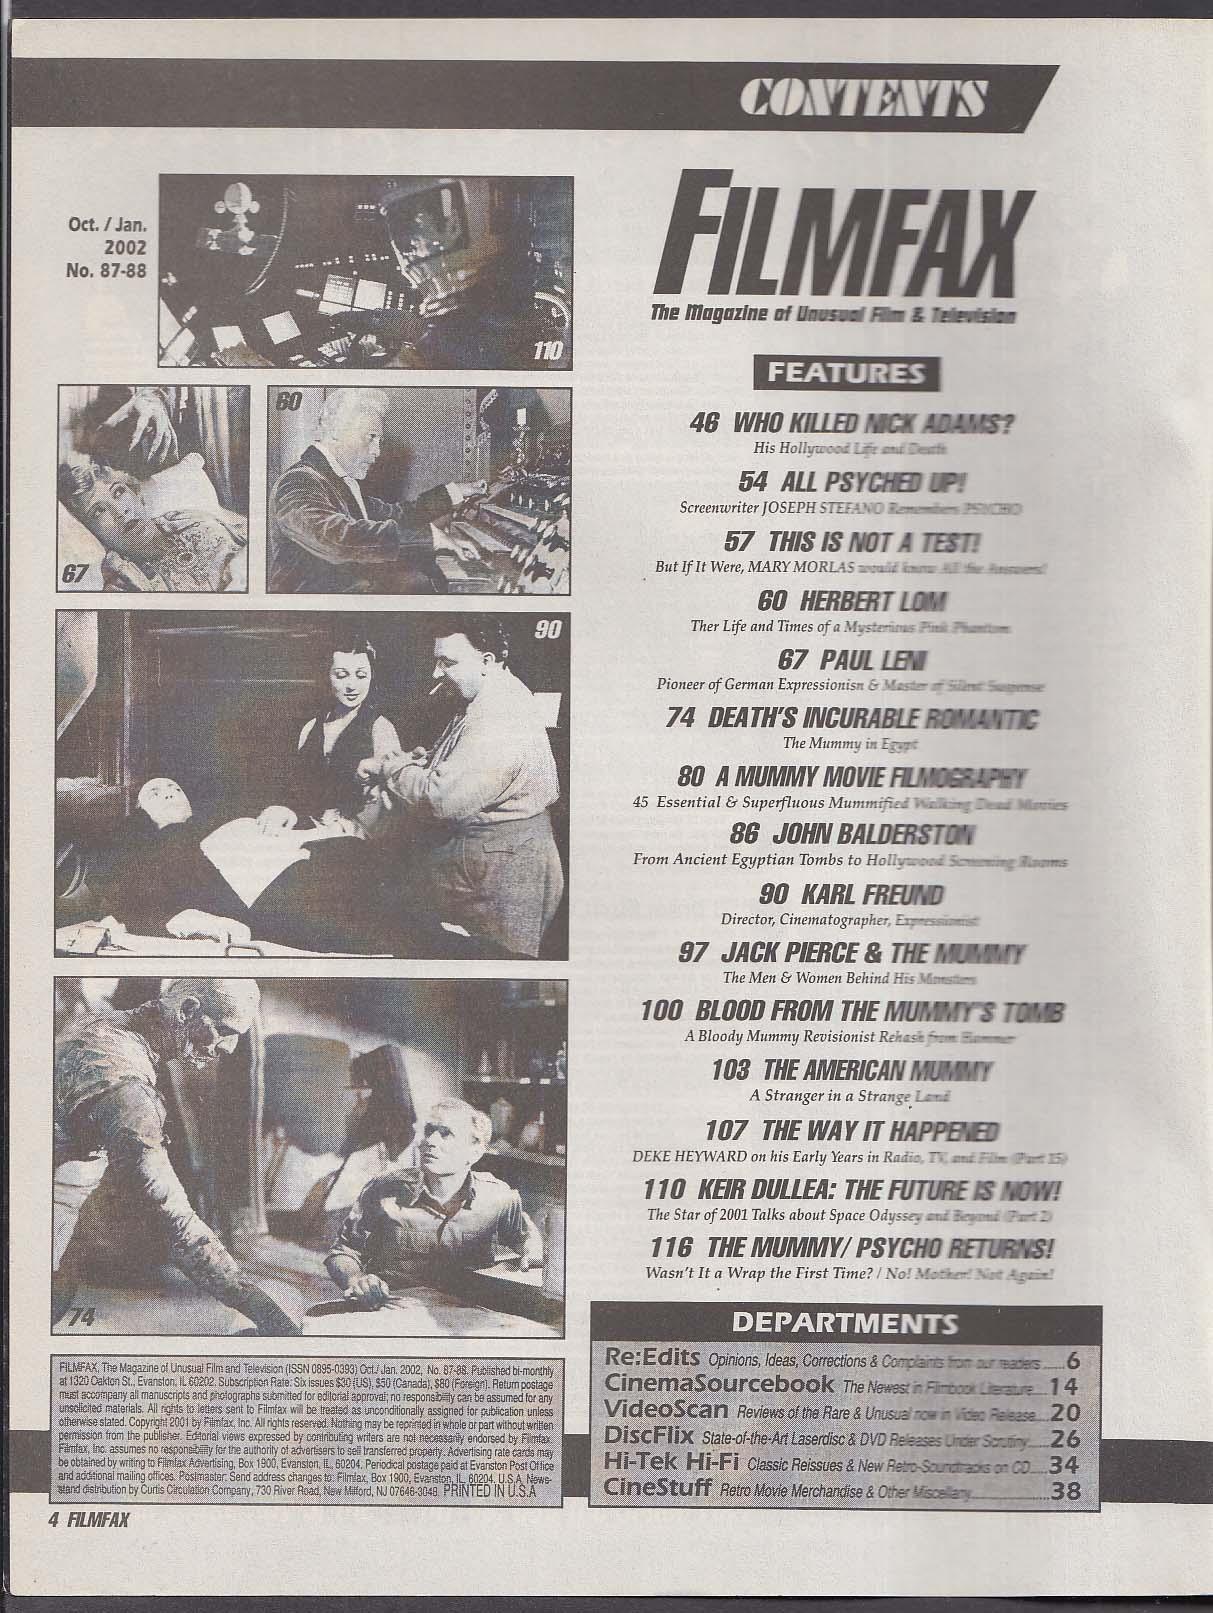 FILMFAX #87-88 Karl Freund John Balderston Jack Pierce Keir Dullea + 1 2002